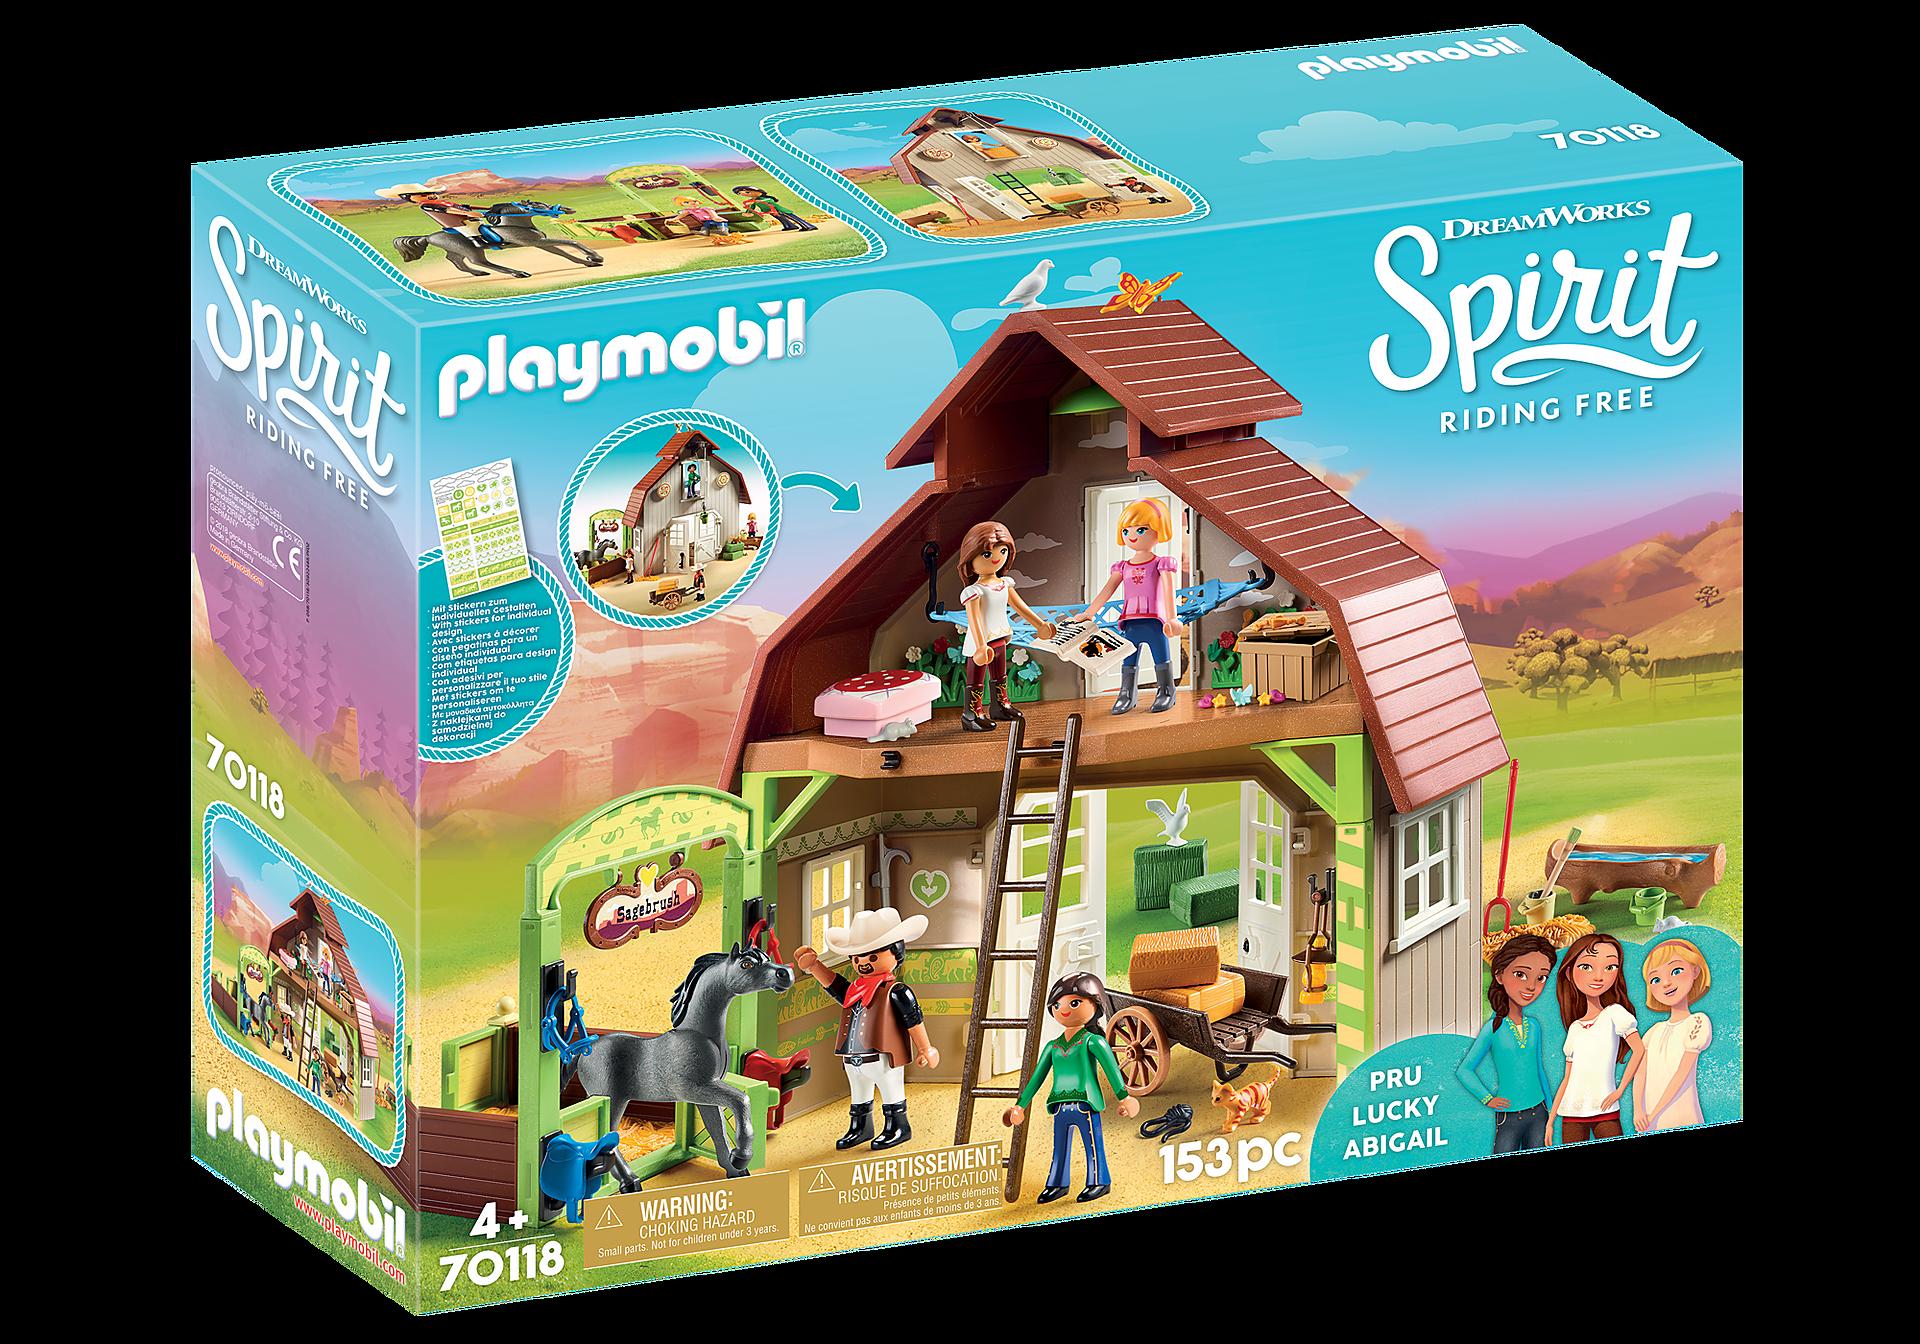 http://media.playmobil.com/i/playmobil/70118_product_box_front/Aχυρώνας με τη Λάκυ, την Πρου και την Άμπιγκεϊλ